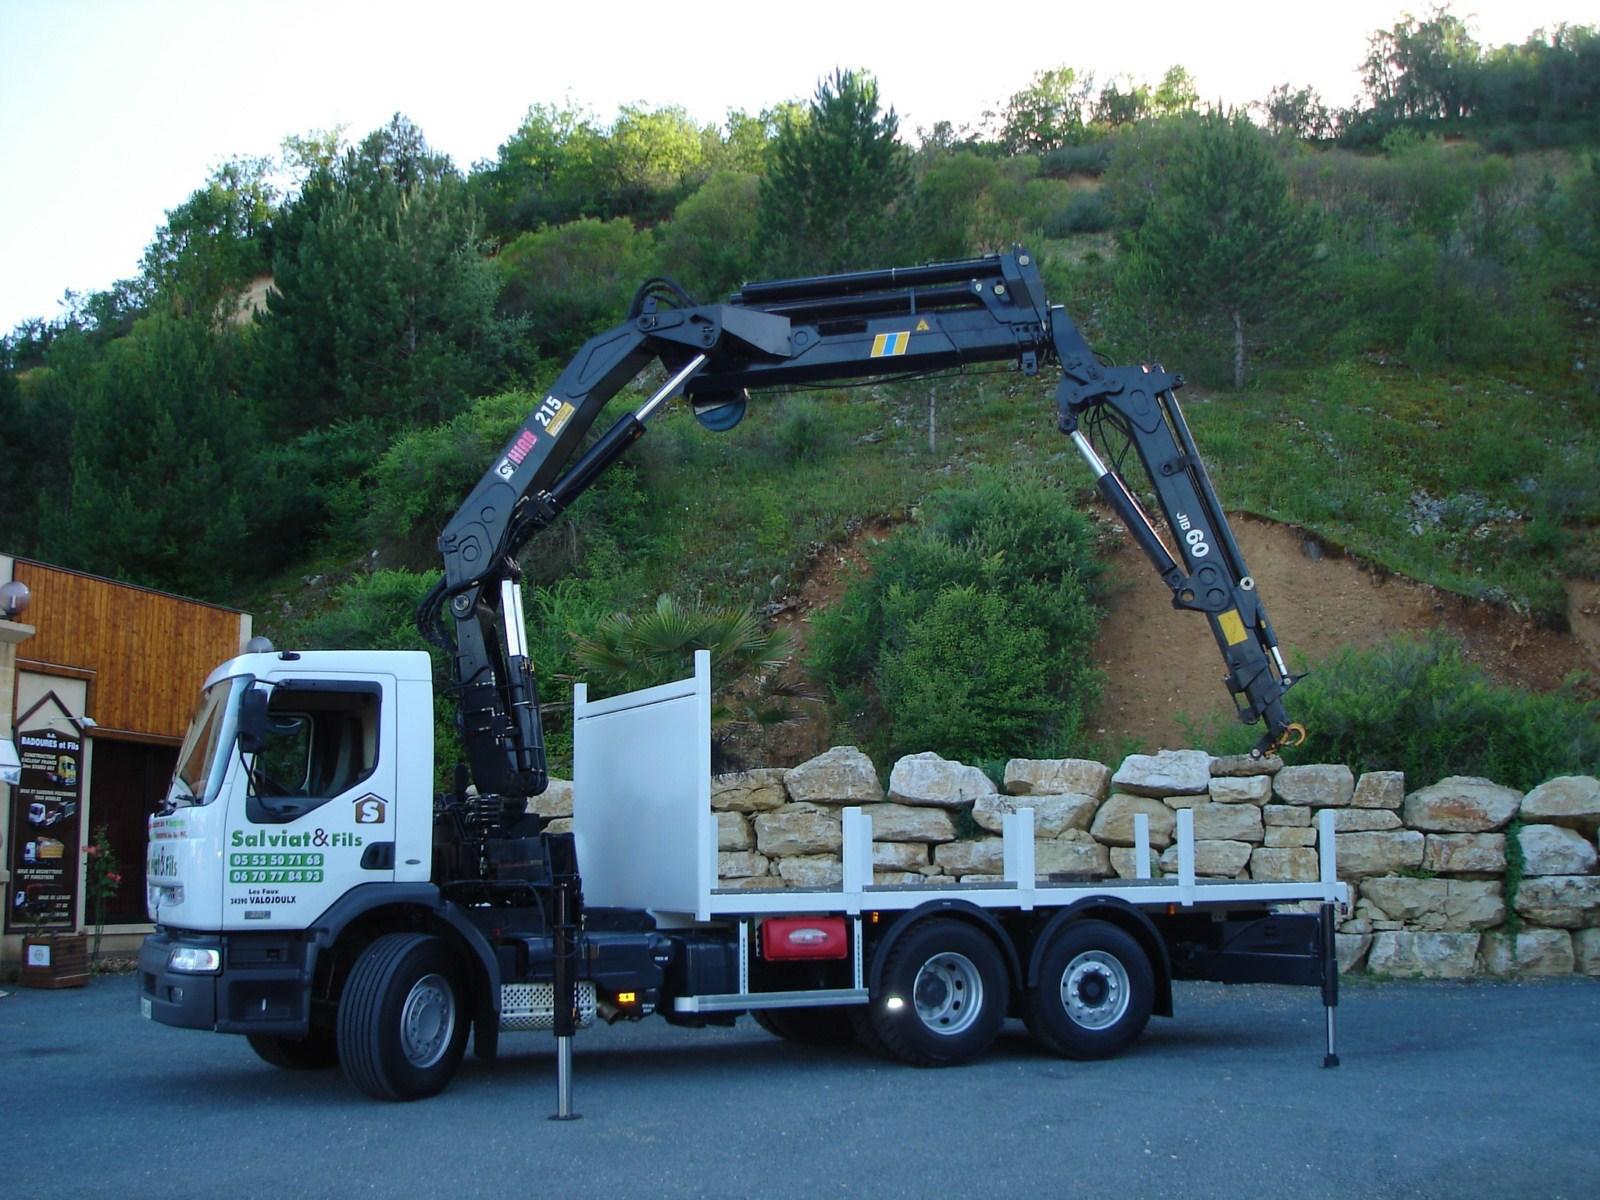 vehicule-poids-lourds-grue-hydraulique